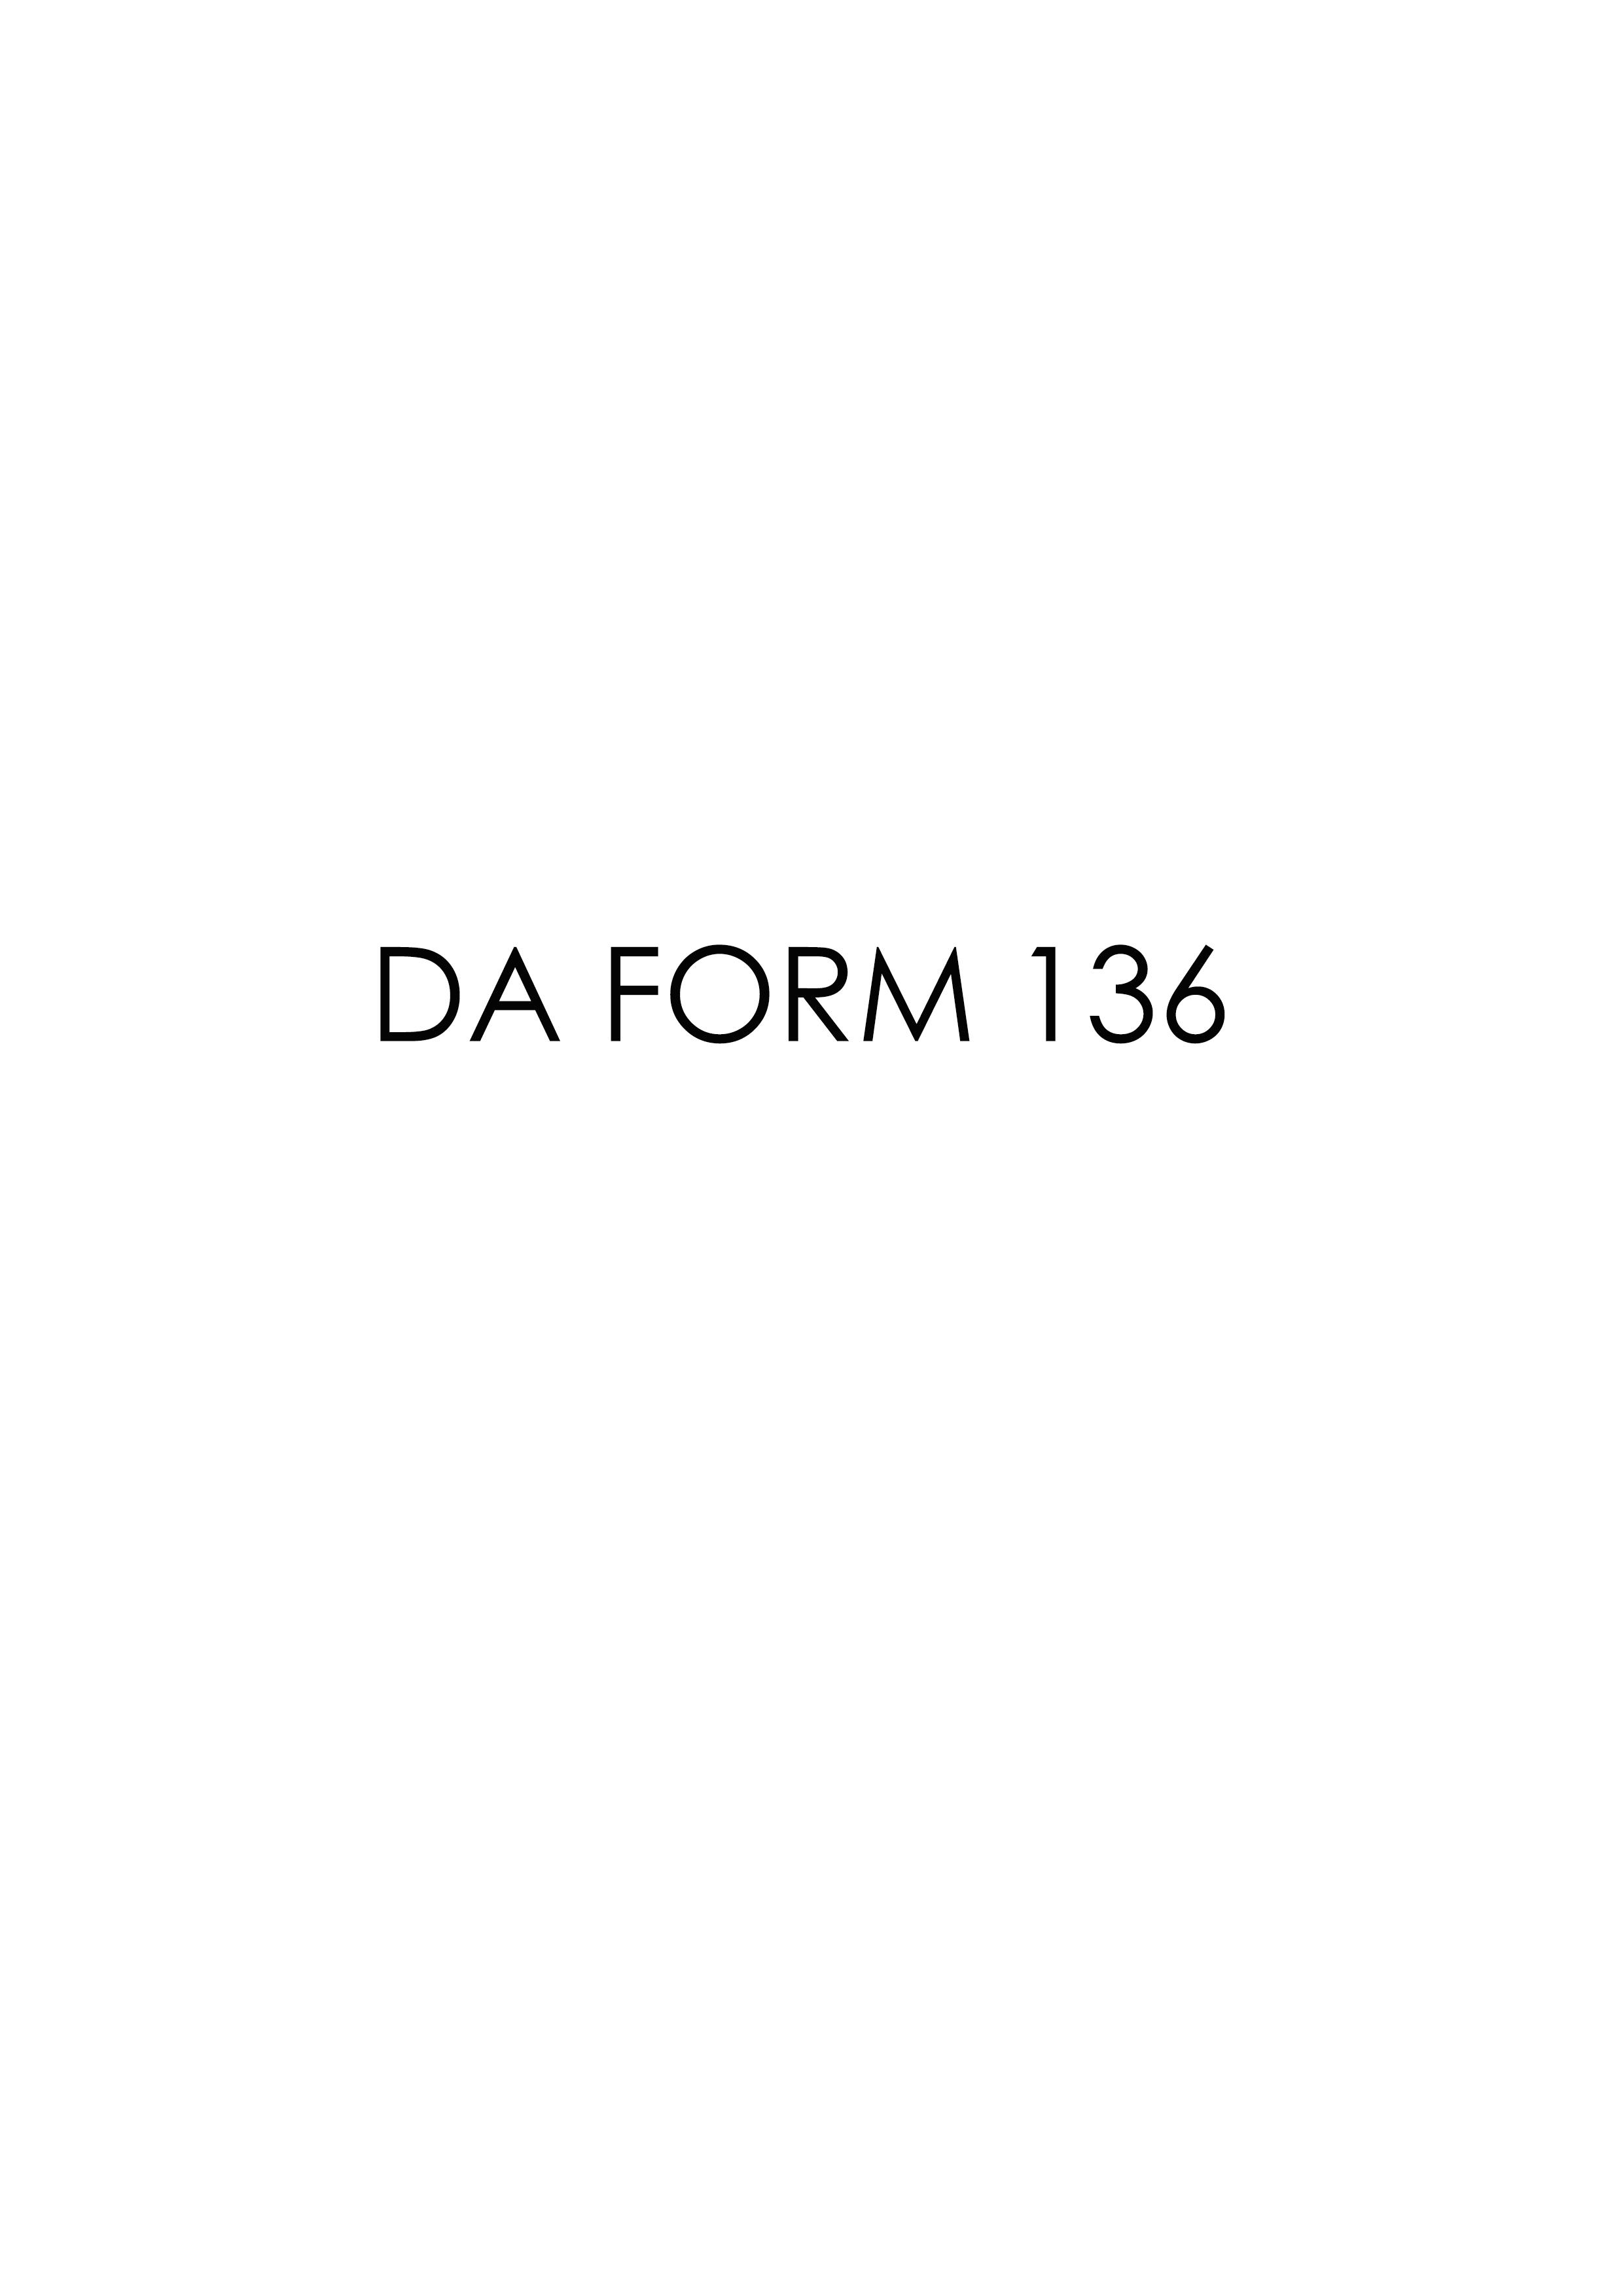 Download Fillable da Form 136